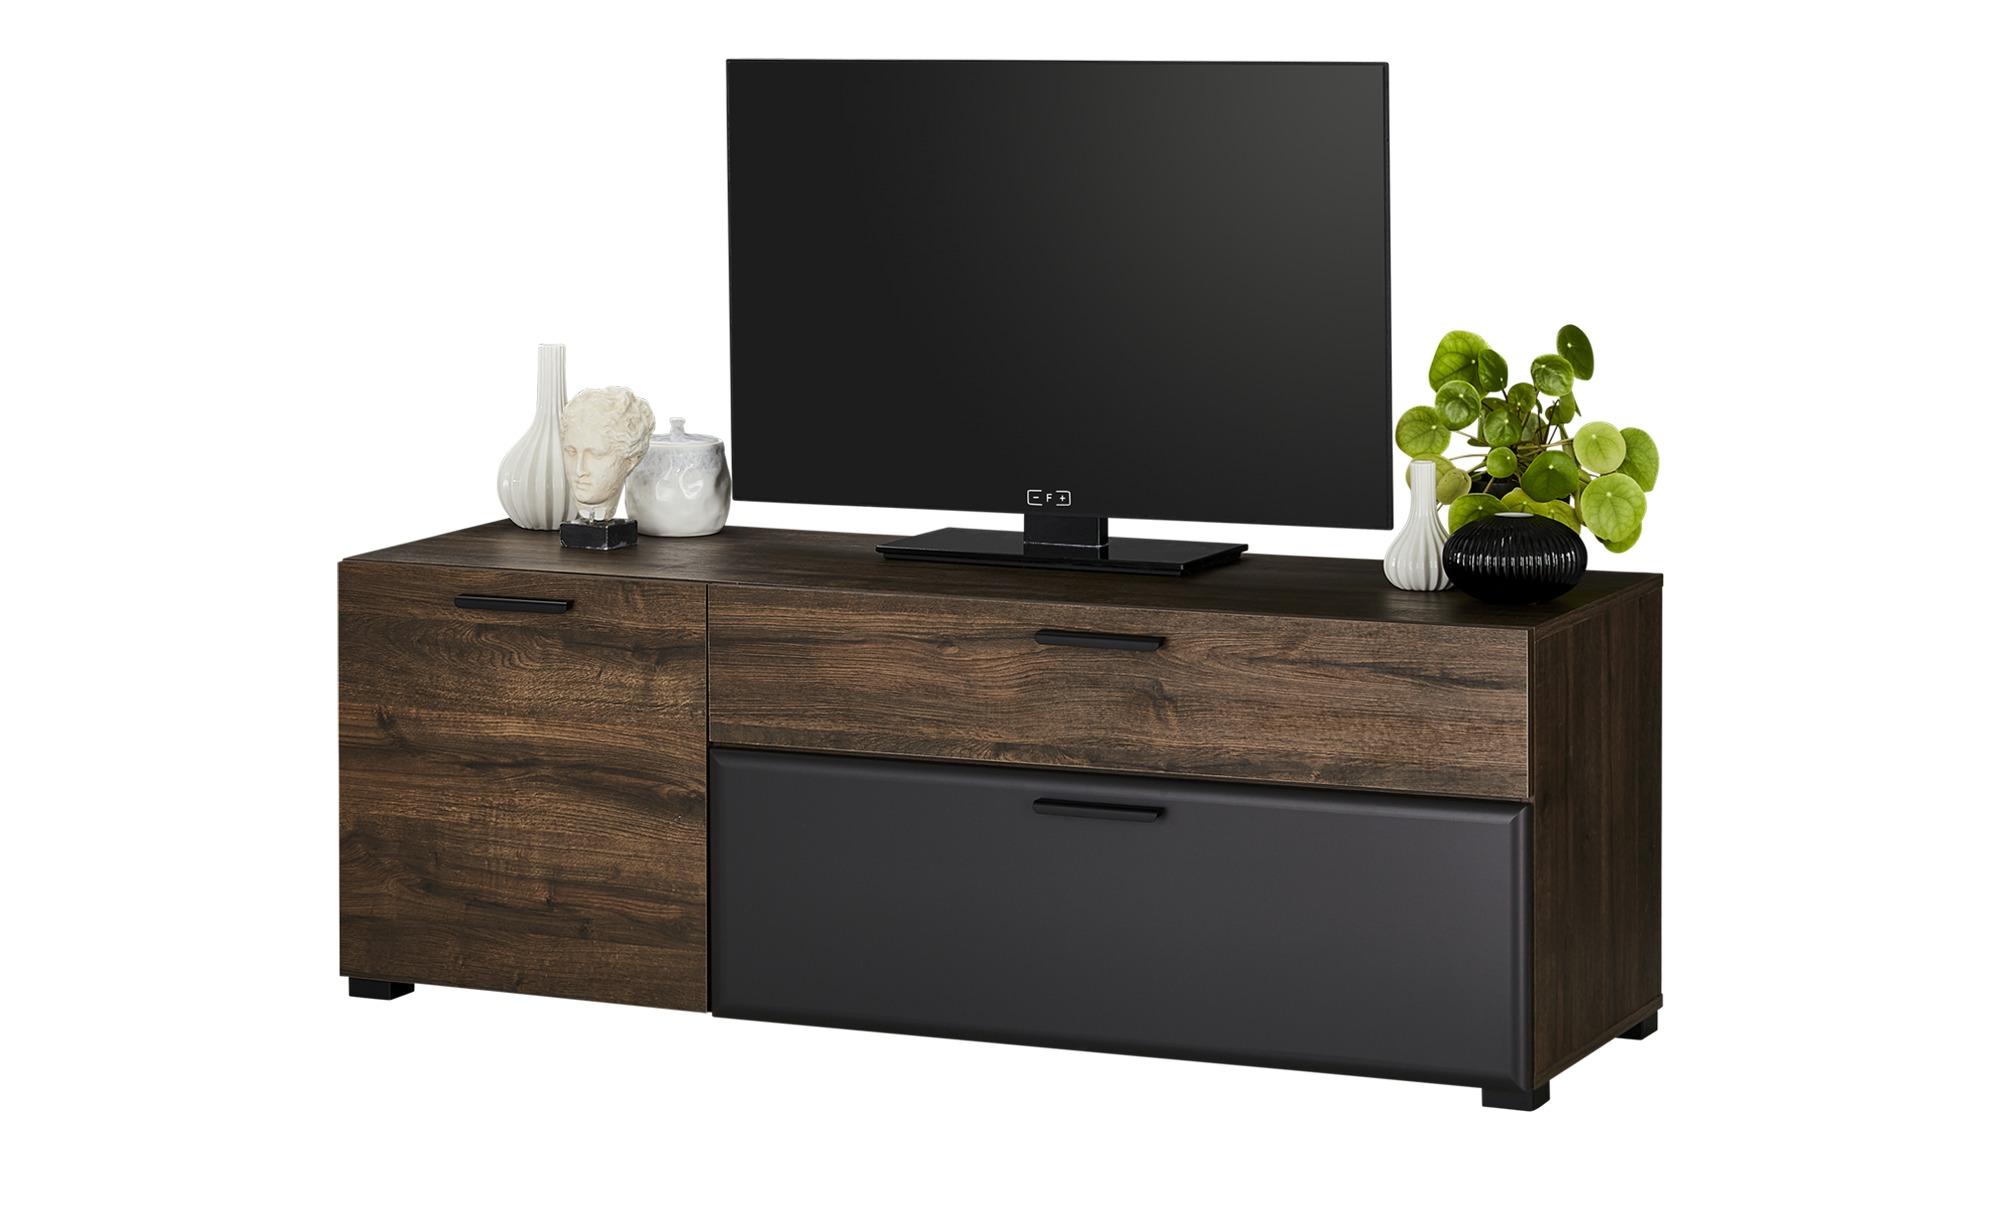 TV-Lowboard  Rimini ¦ grau ¦ Maße (cm): B: 150 H: 53 T: 50 TV- & Media Möbel > TV-Racks - Höffner